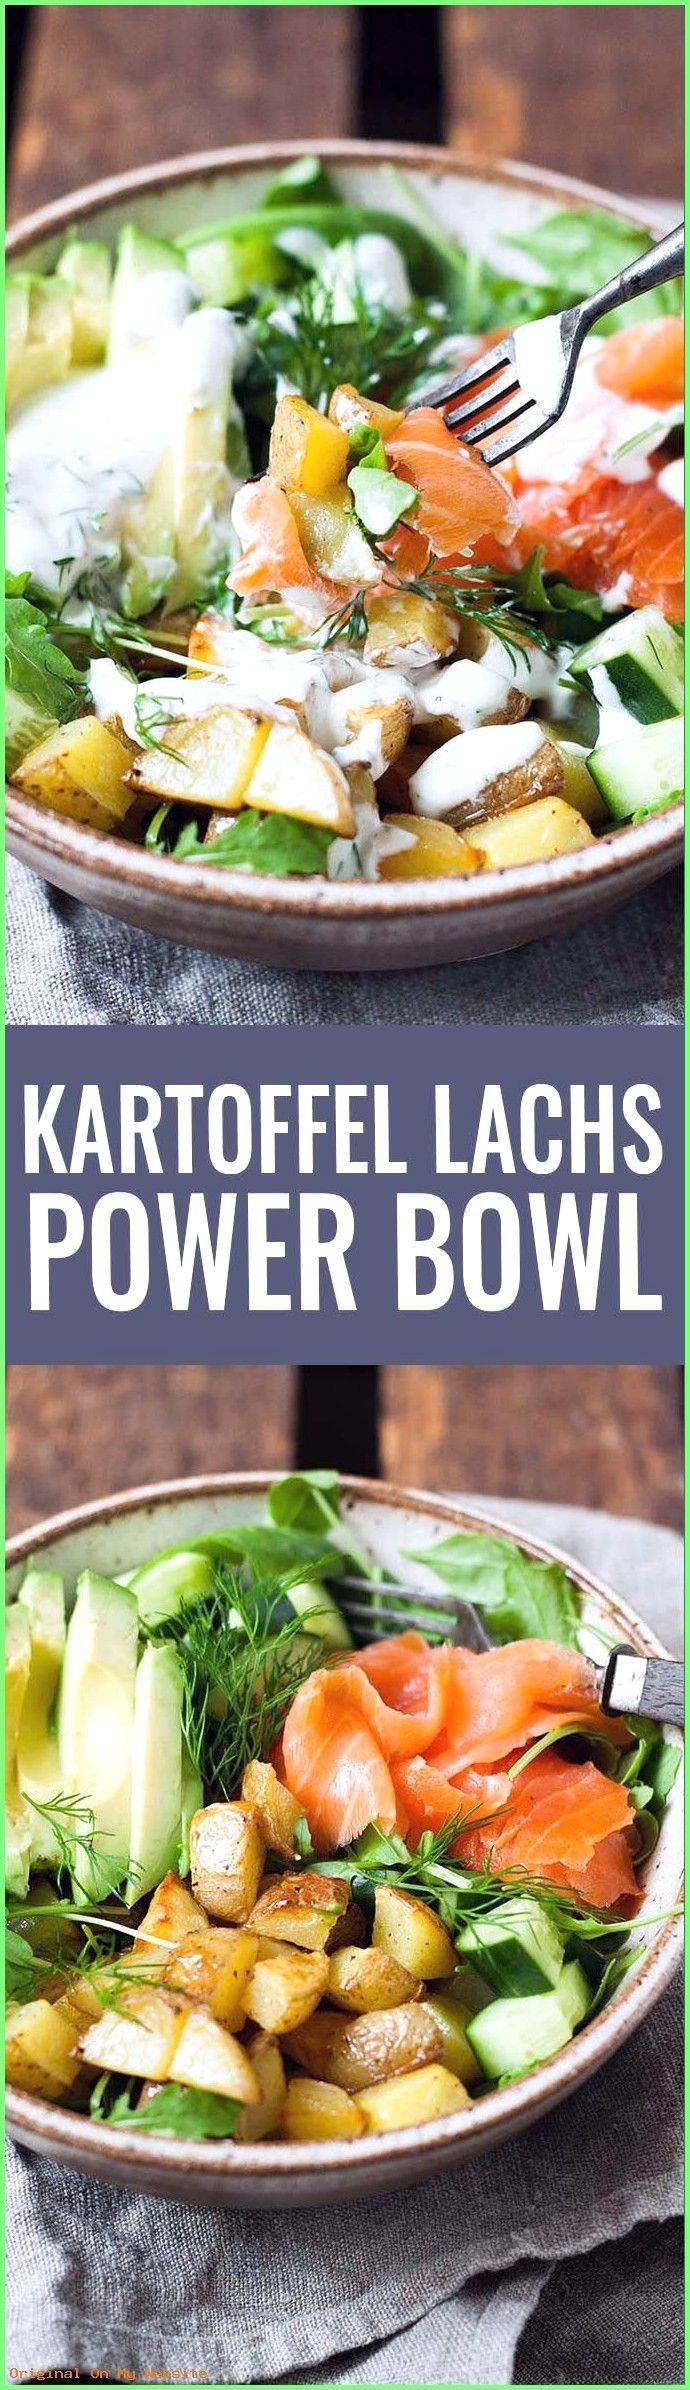 Buddha Bowl Rezepte: Kartoffel Lachs Power Bowl mit Avocado – Kochkarussell.com  #BuddhaBowlR…